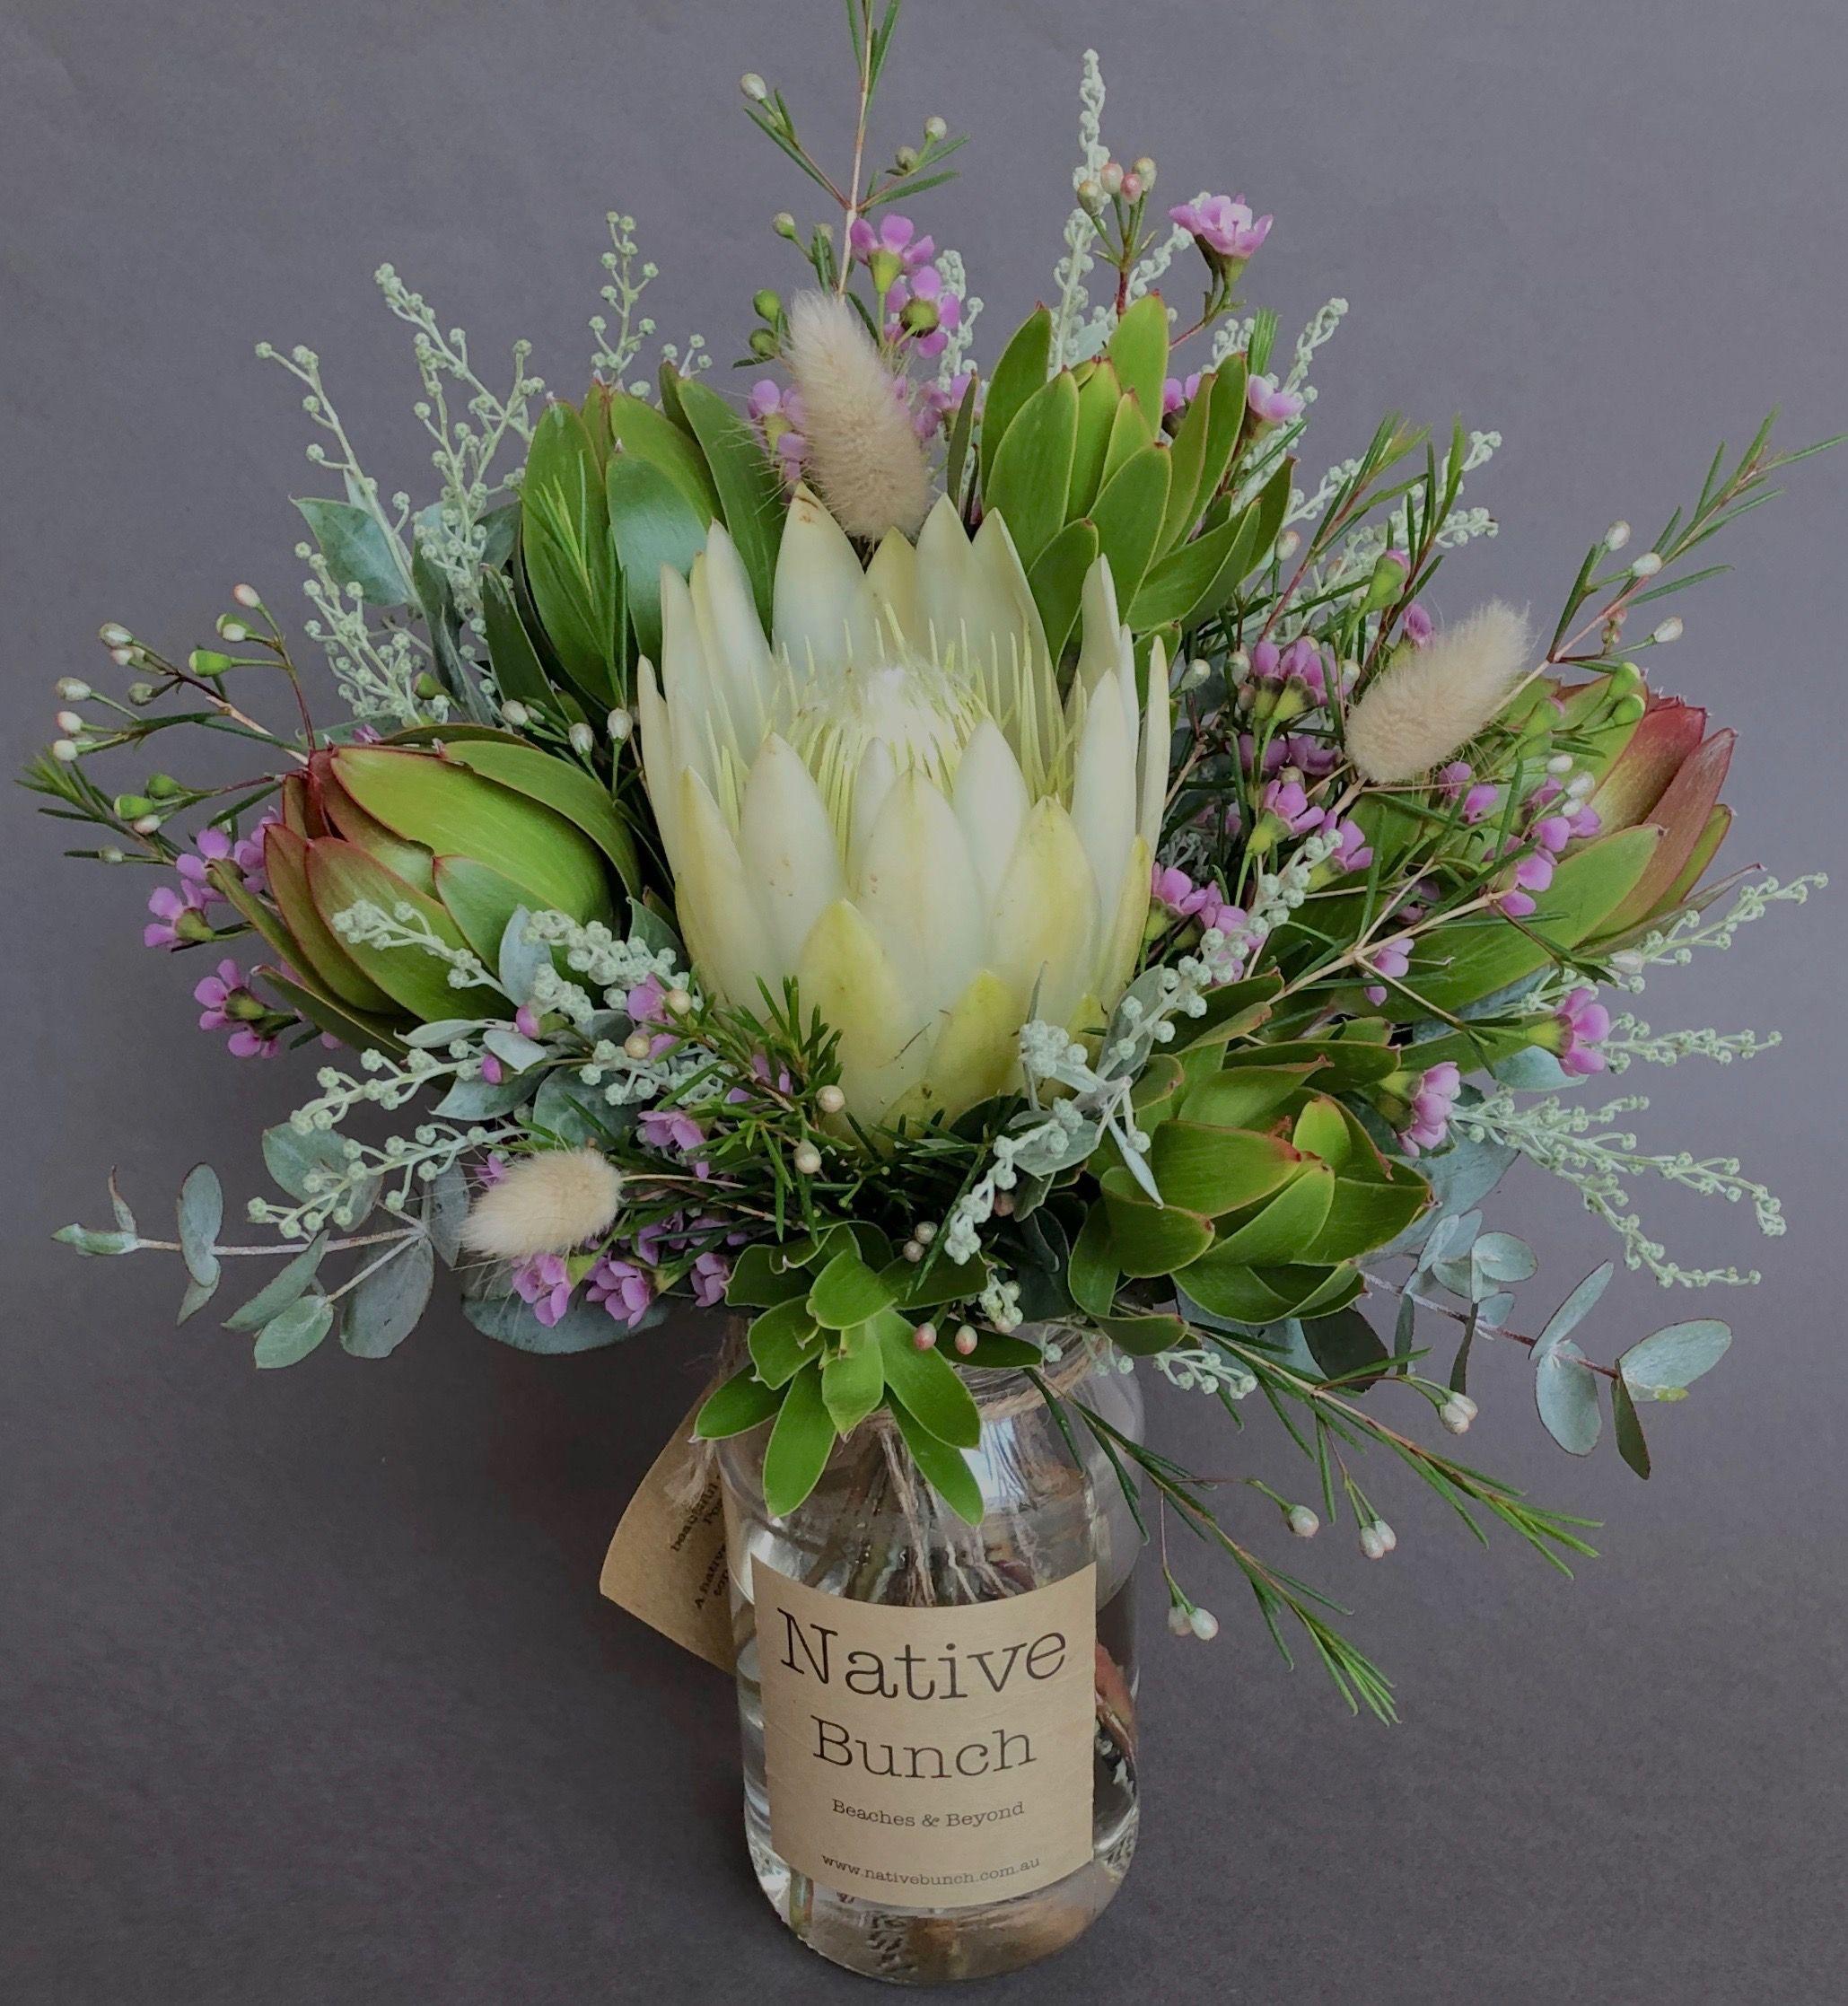 Native Flower Posy By Native Bunch In 2020 Table Flower Arrangements Australian Native Flowers Flower Delivery